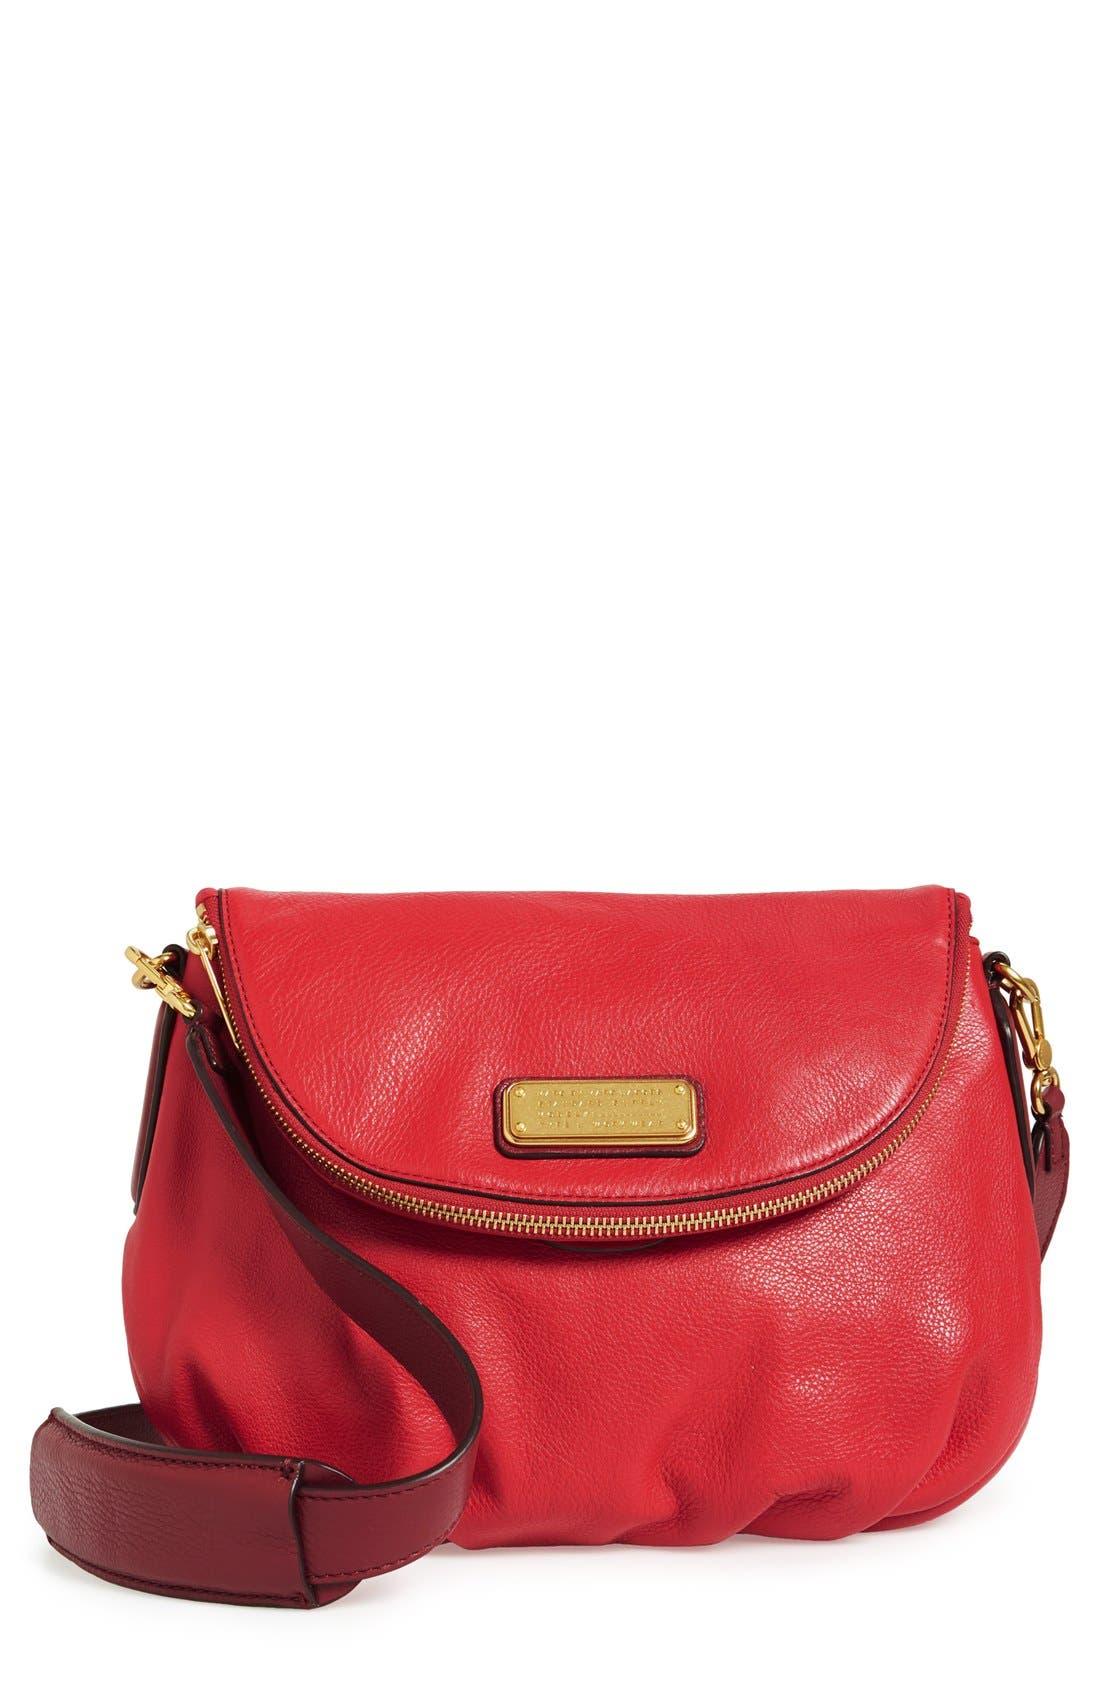 Alternate Image 1 Selected - MARC BY MARC JACOBS 'New Q - Natasha' Crossbody Bag